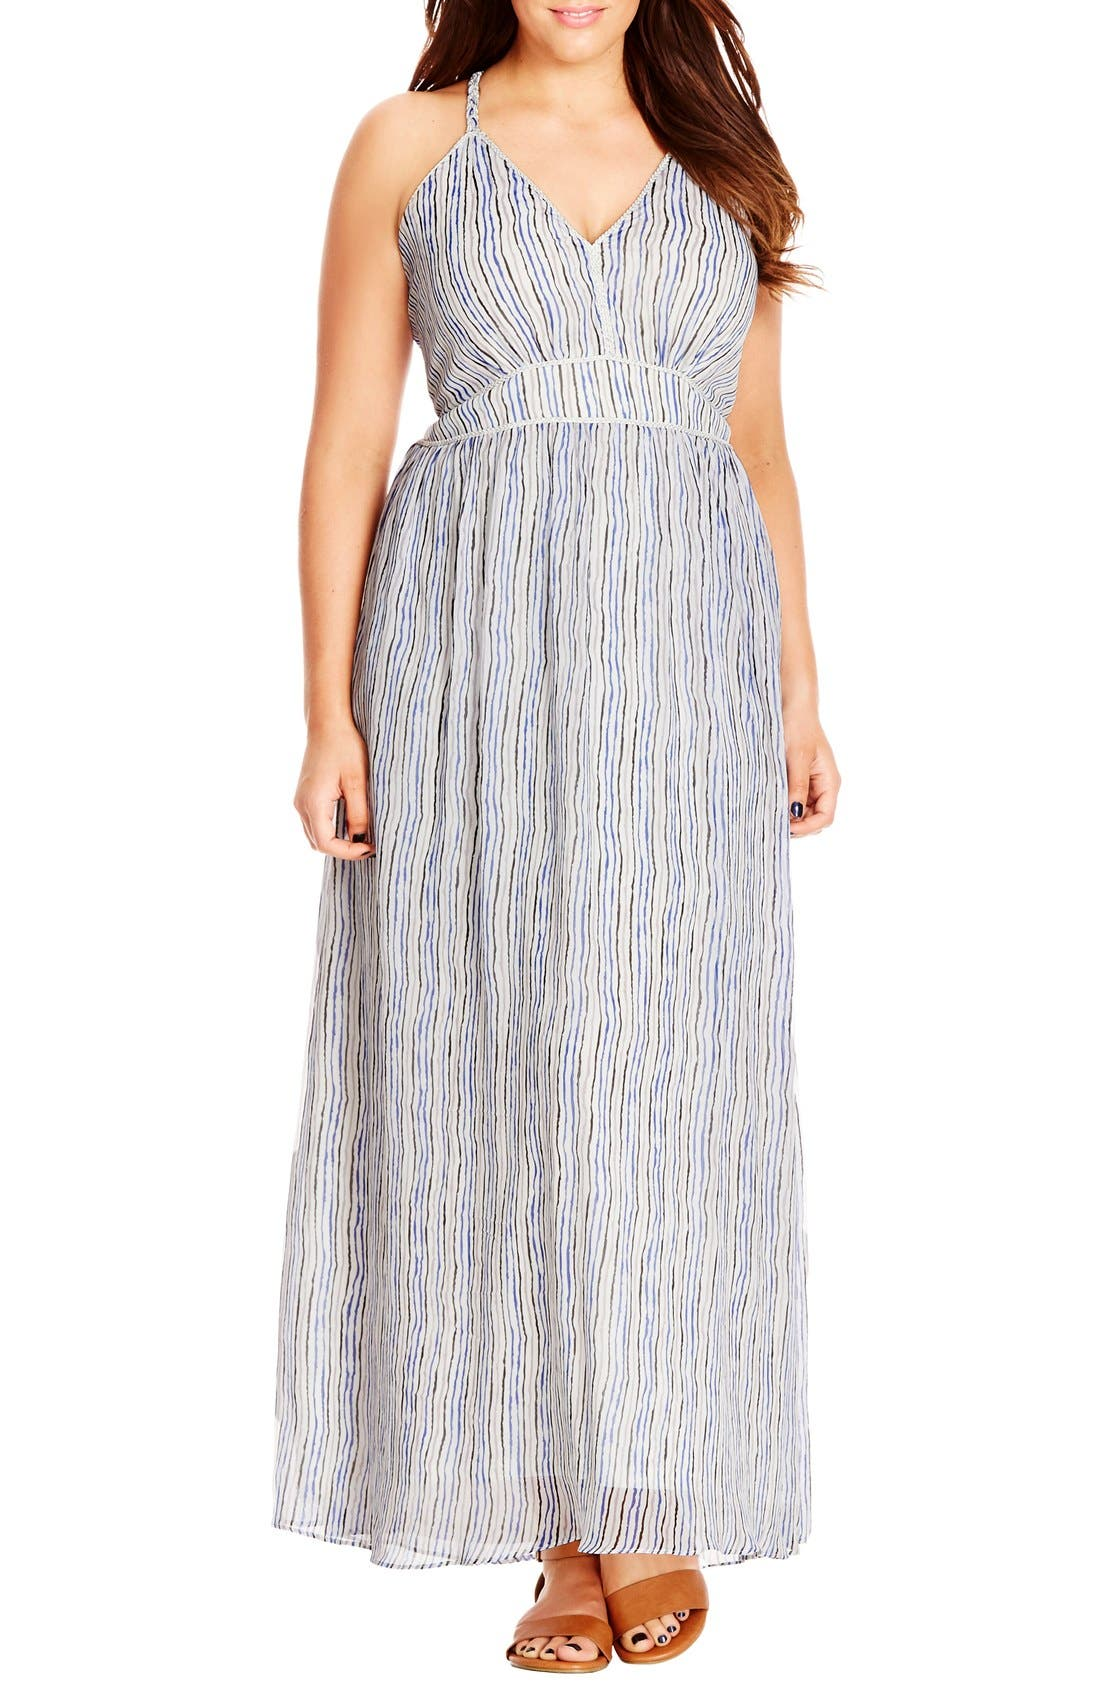 CITY CHIC Metallic Plait Trim Stripe Maxi Dress